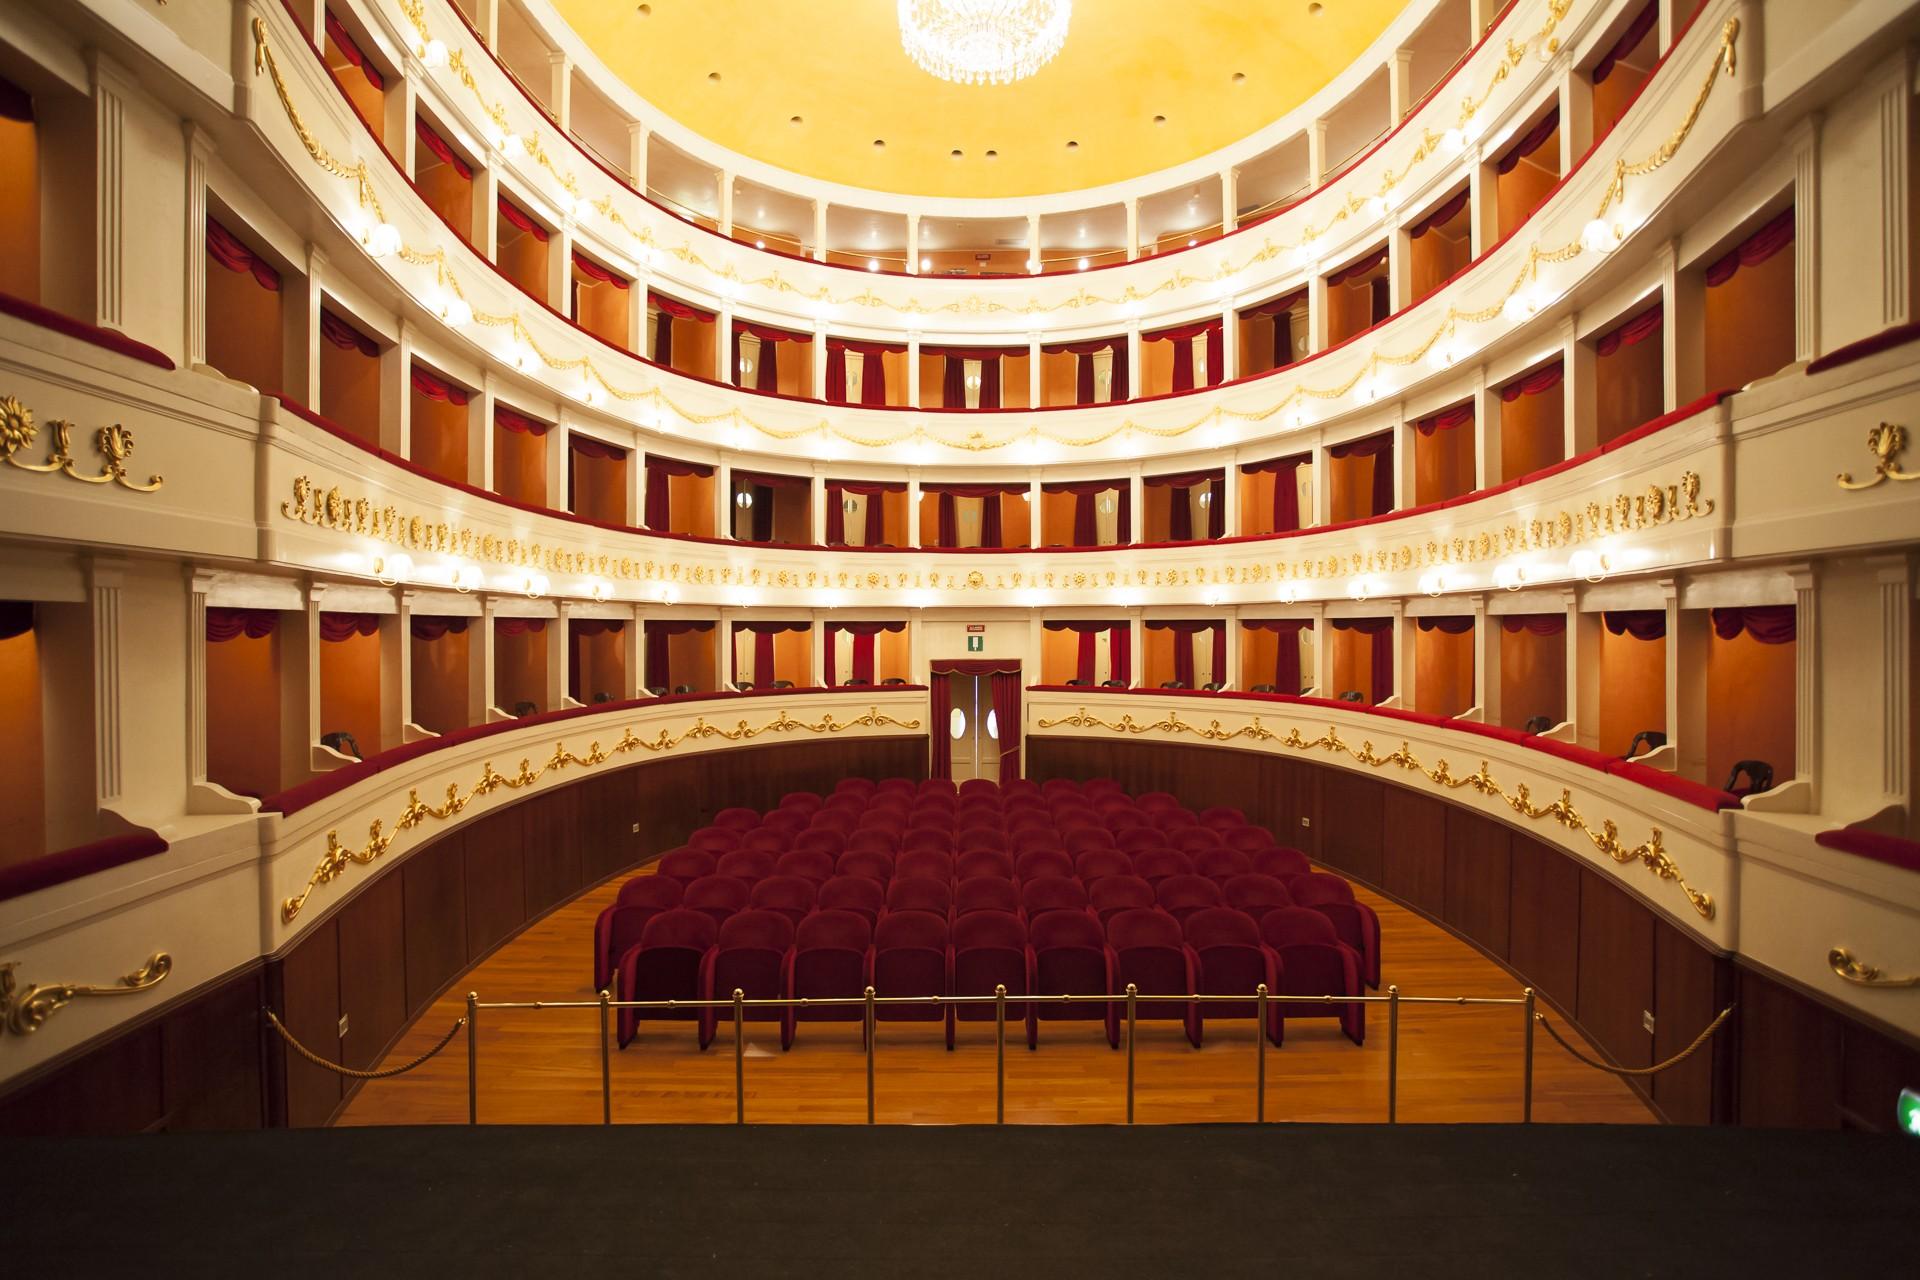 Ufficio Web Architetti Sassari : Architetti sassari. teatro civico interno sassari with architetti